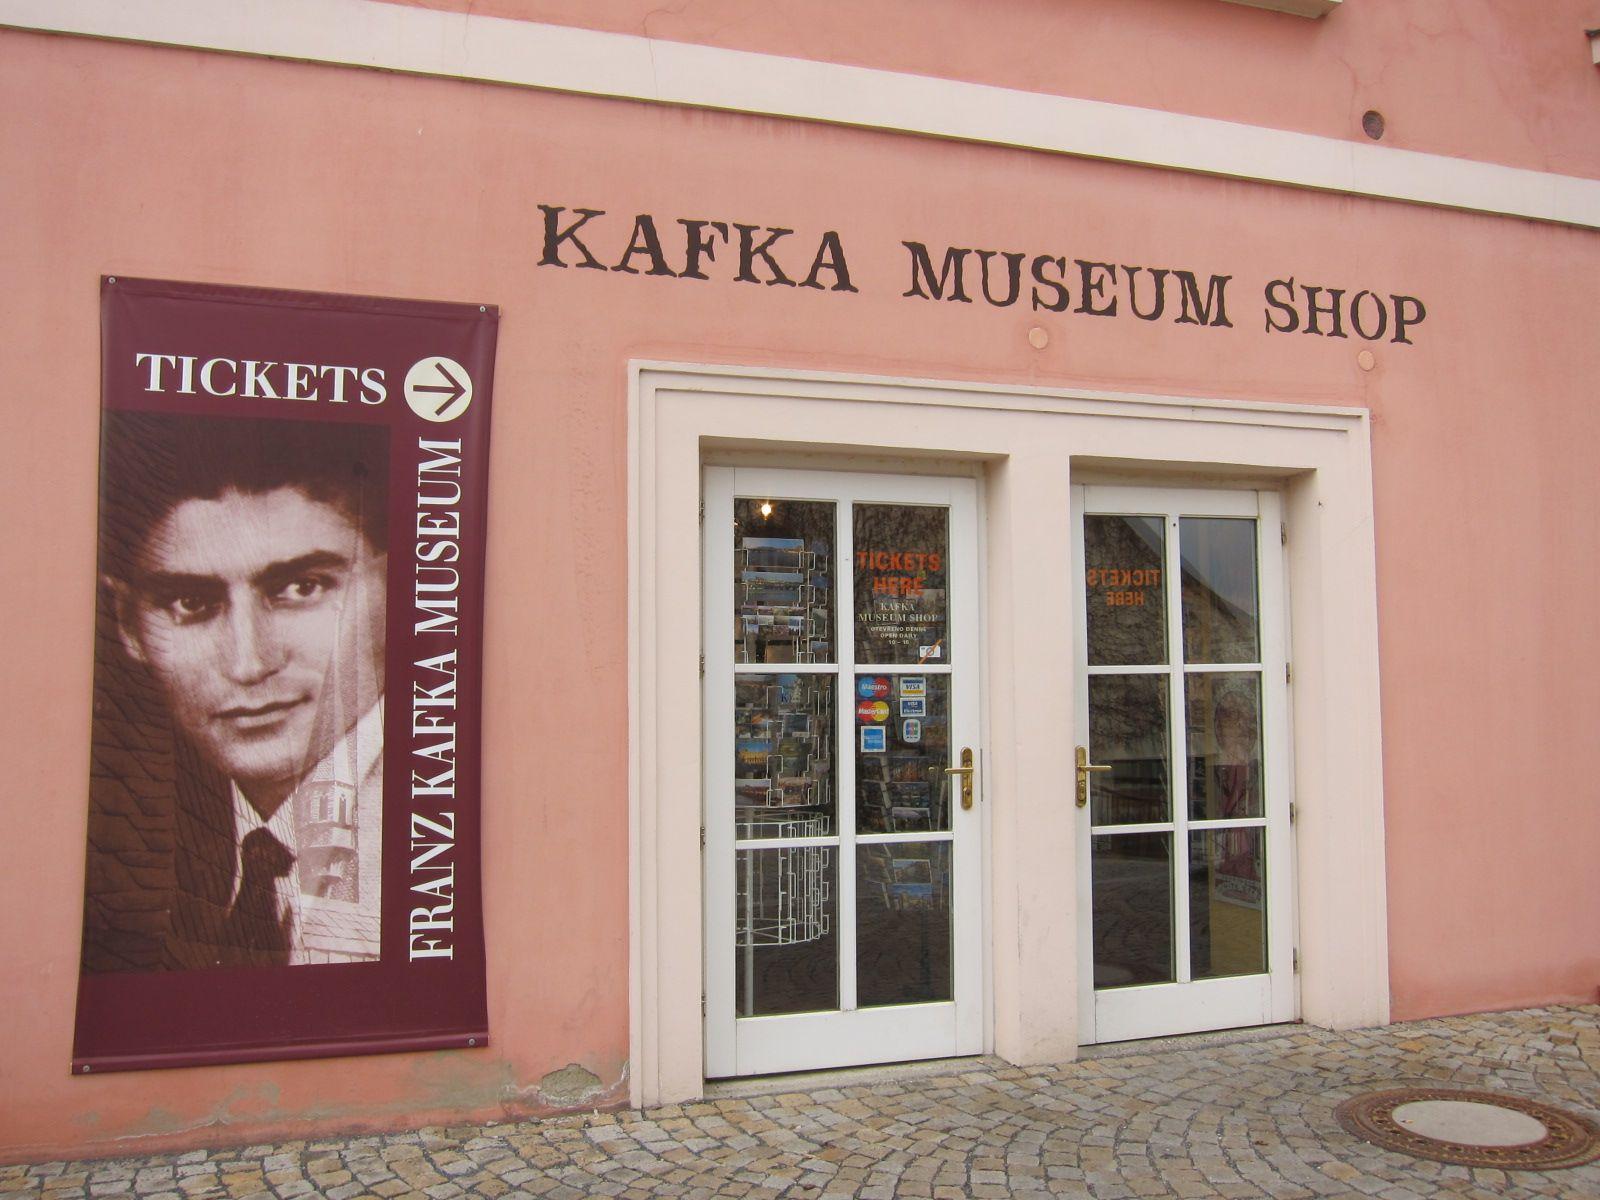 Kafka Museum Shop, Prague